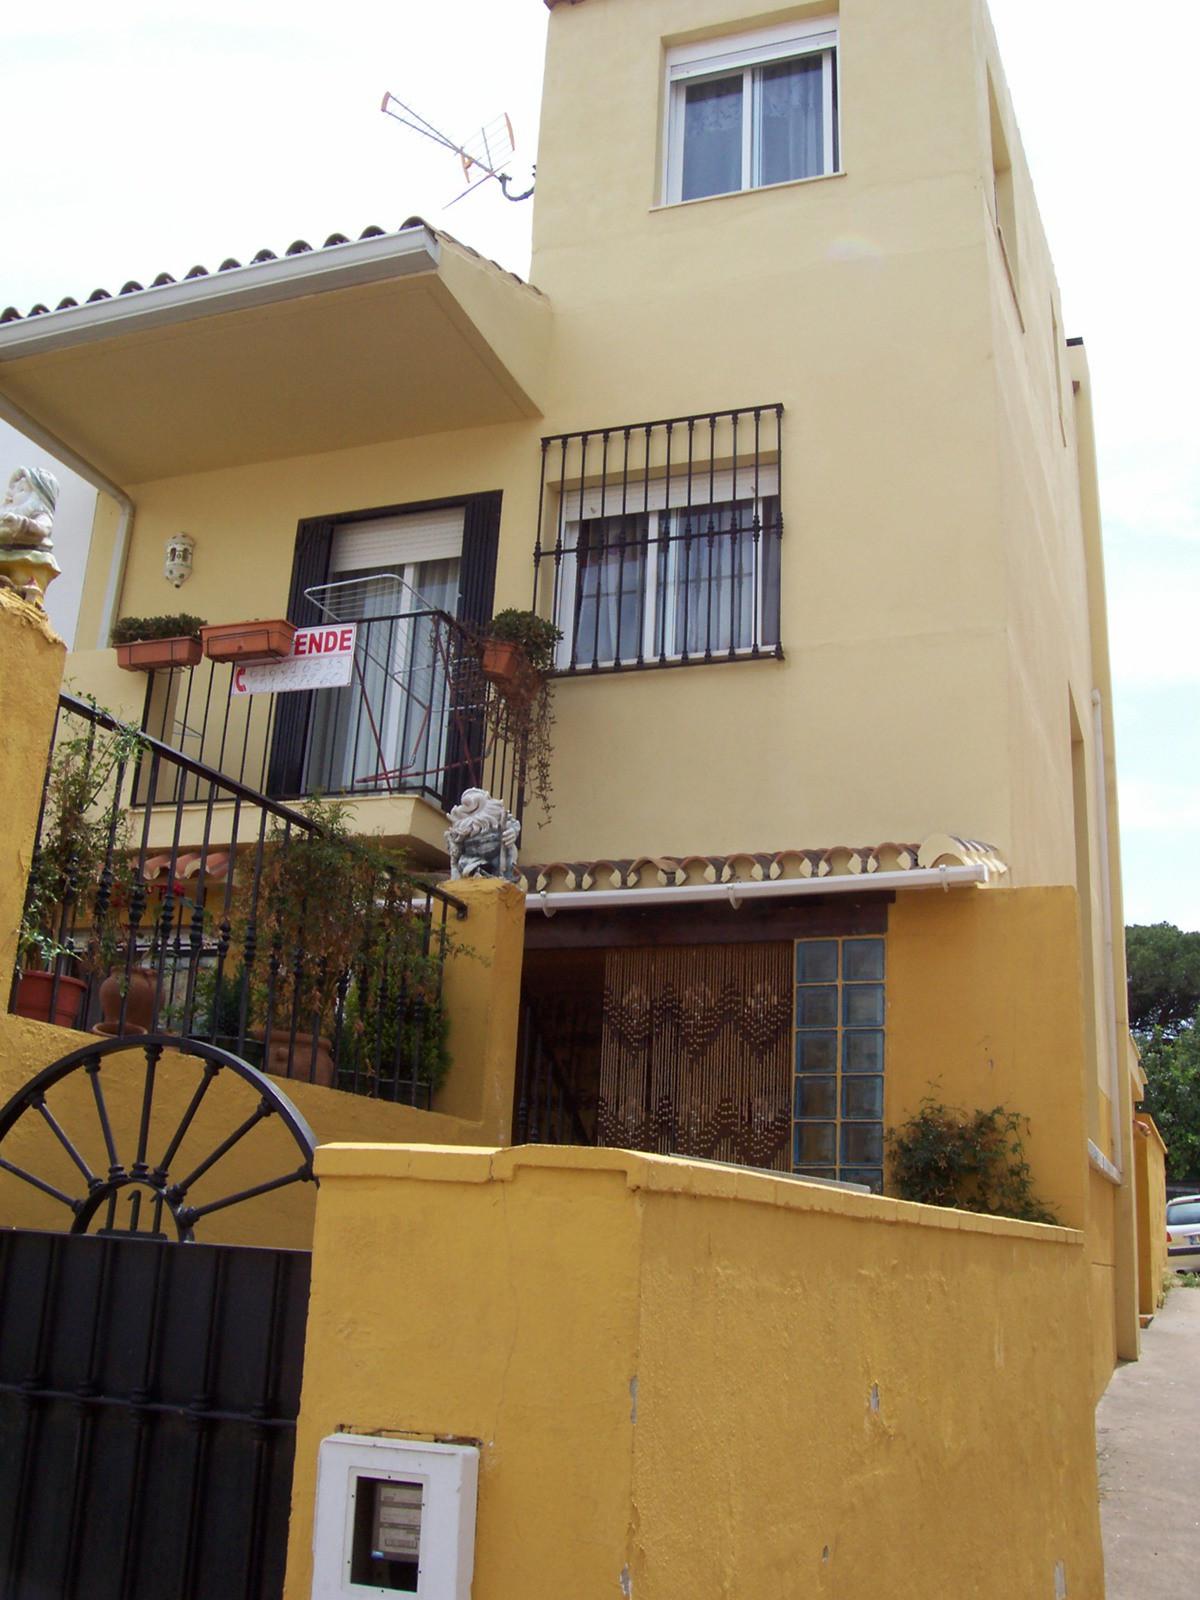 Rijhuis - Marbella